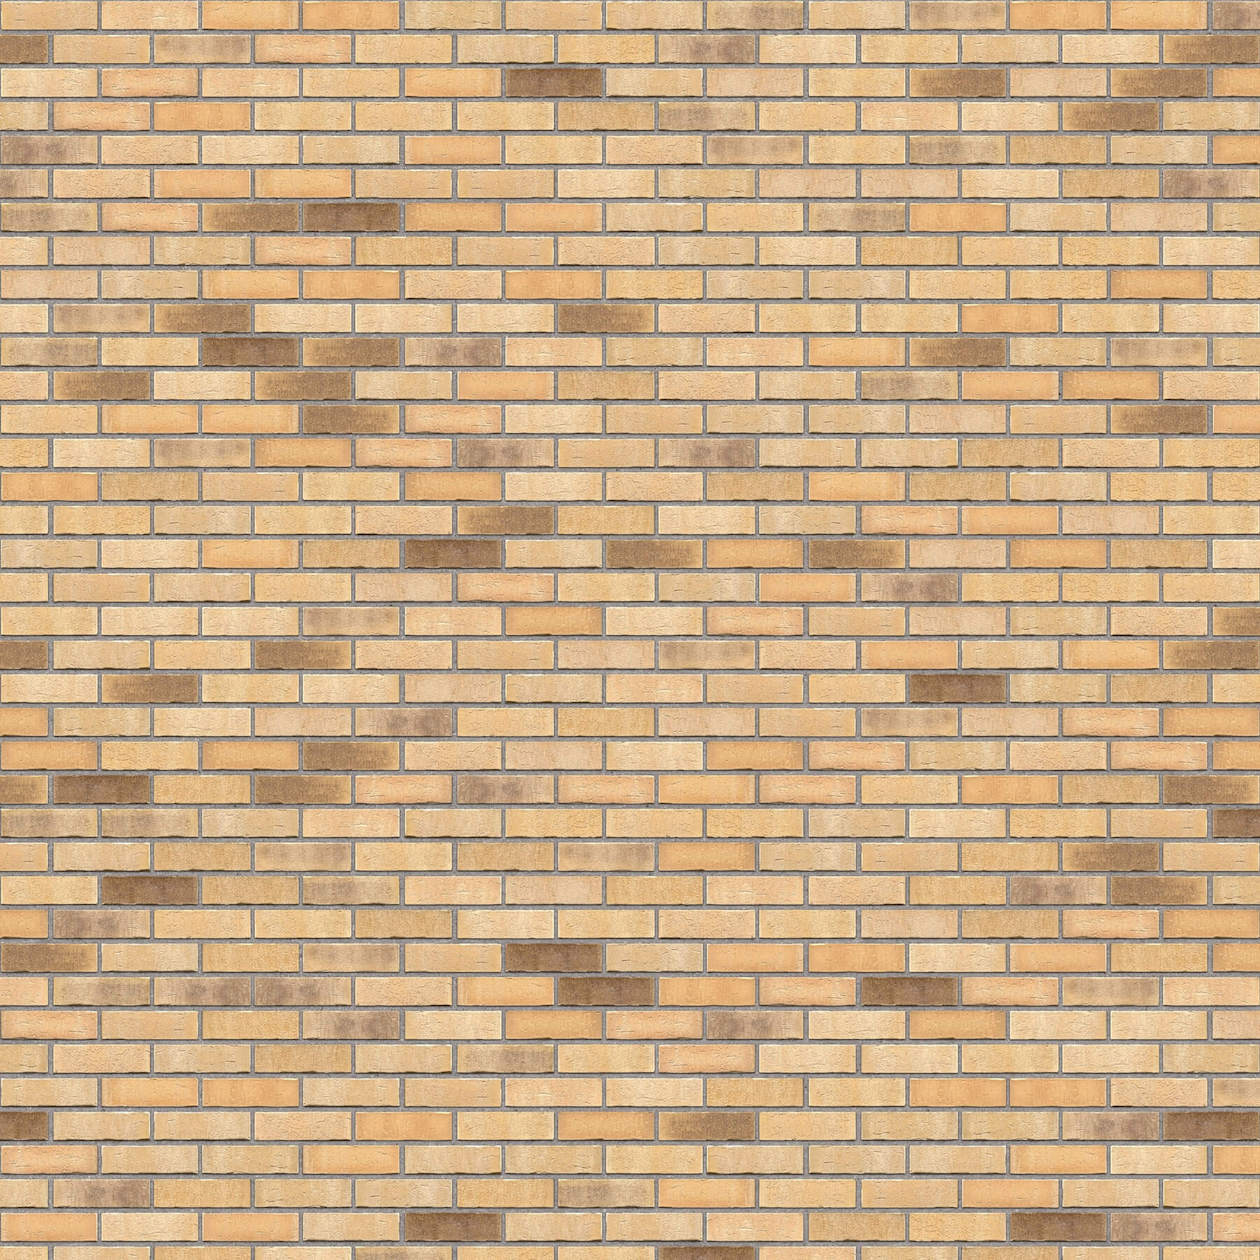 Puna-cigla-FeldHaus-Klinker-brick-house-Beograd-nf-k-723-Siva Fuga